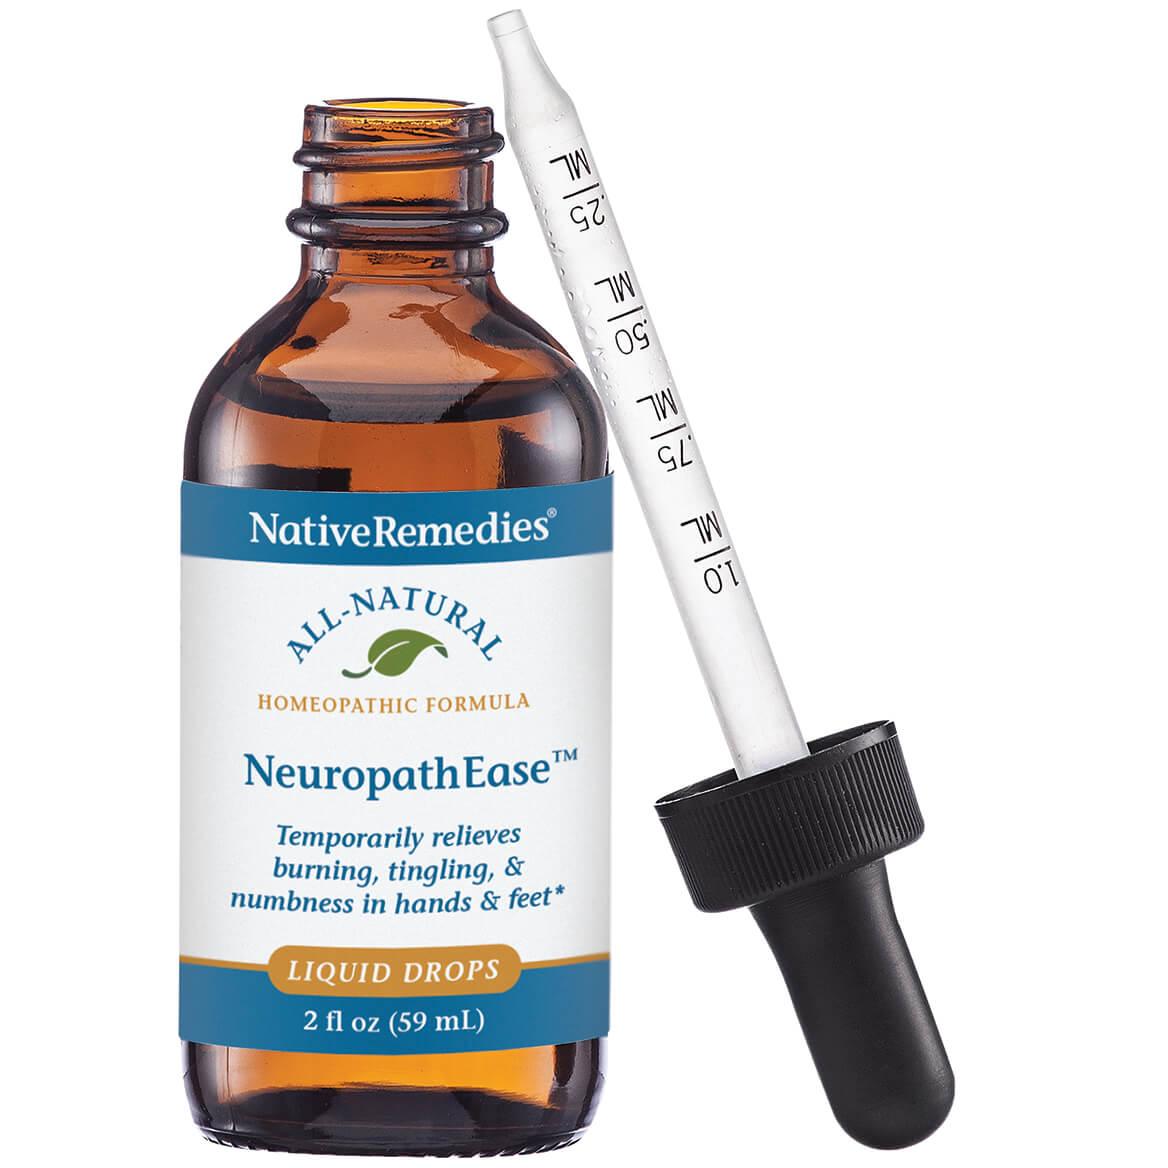 NativeRemedies® NeuropathEase™-367001